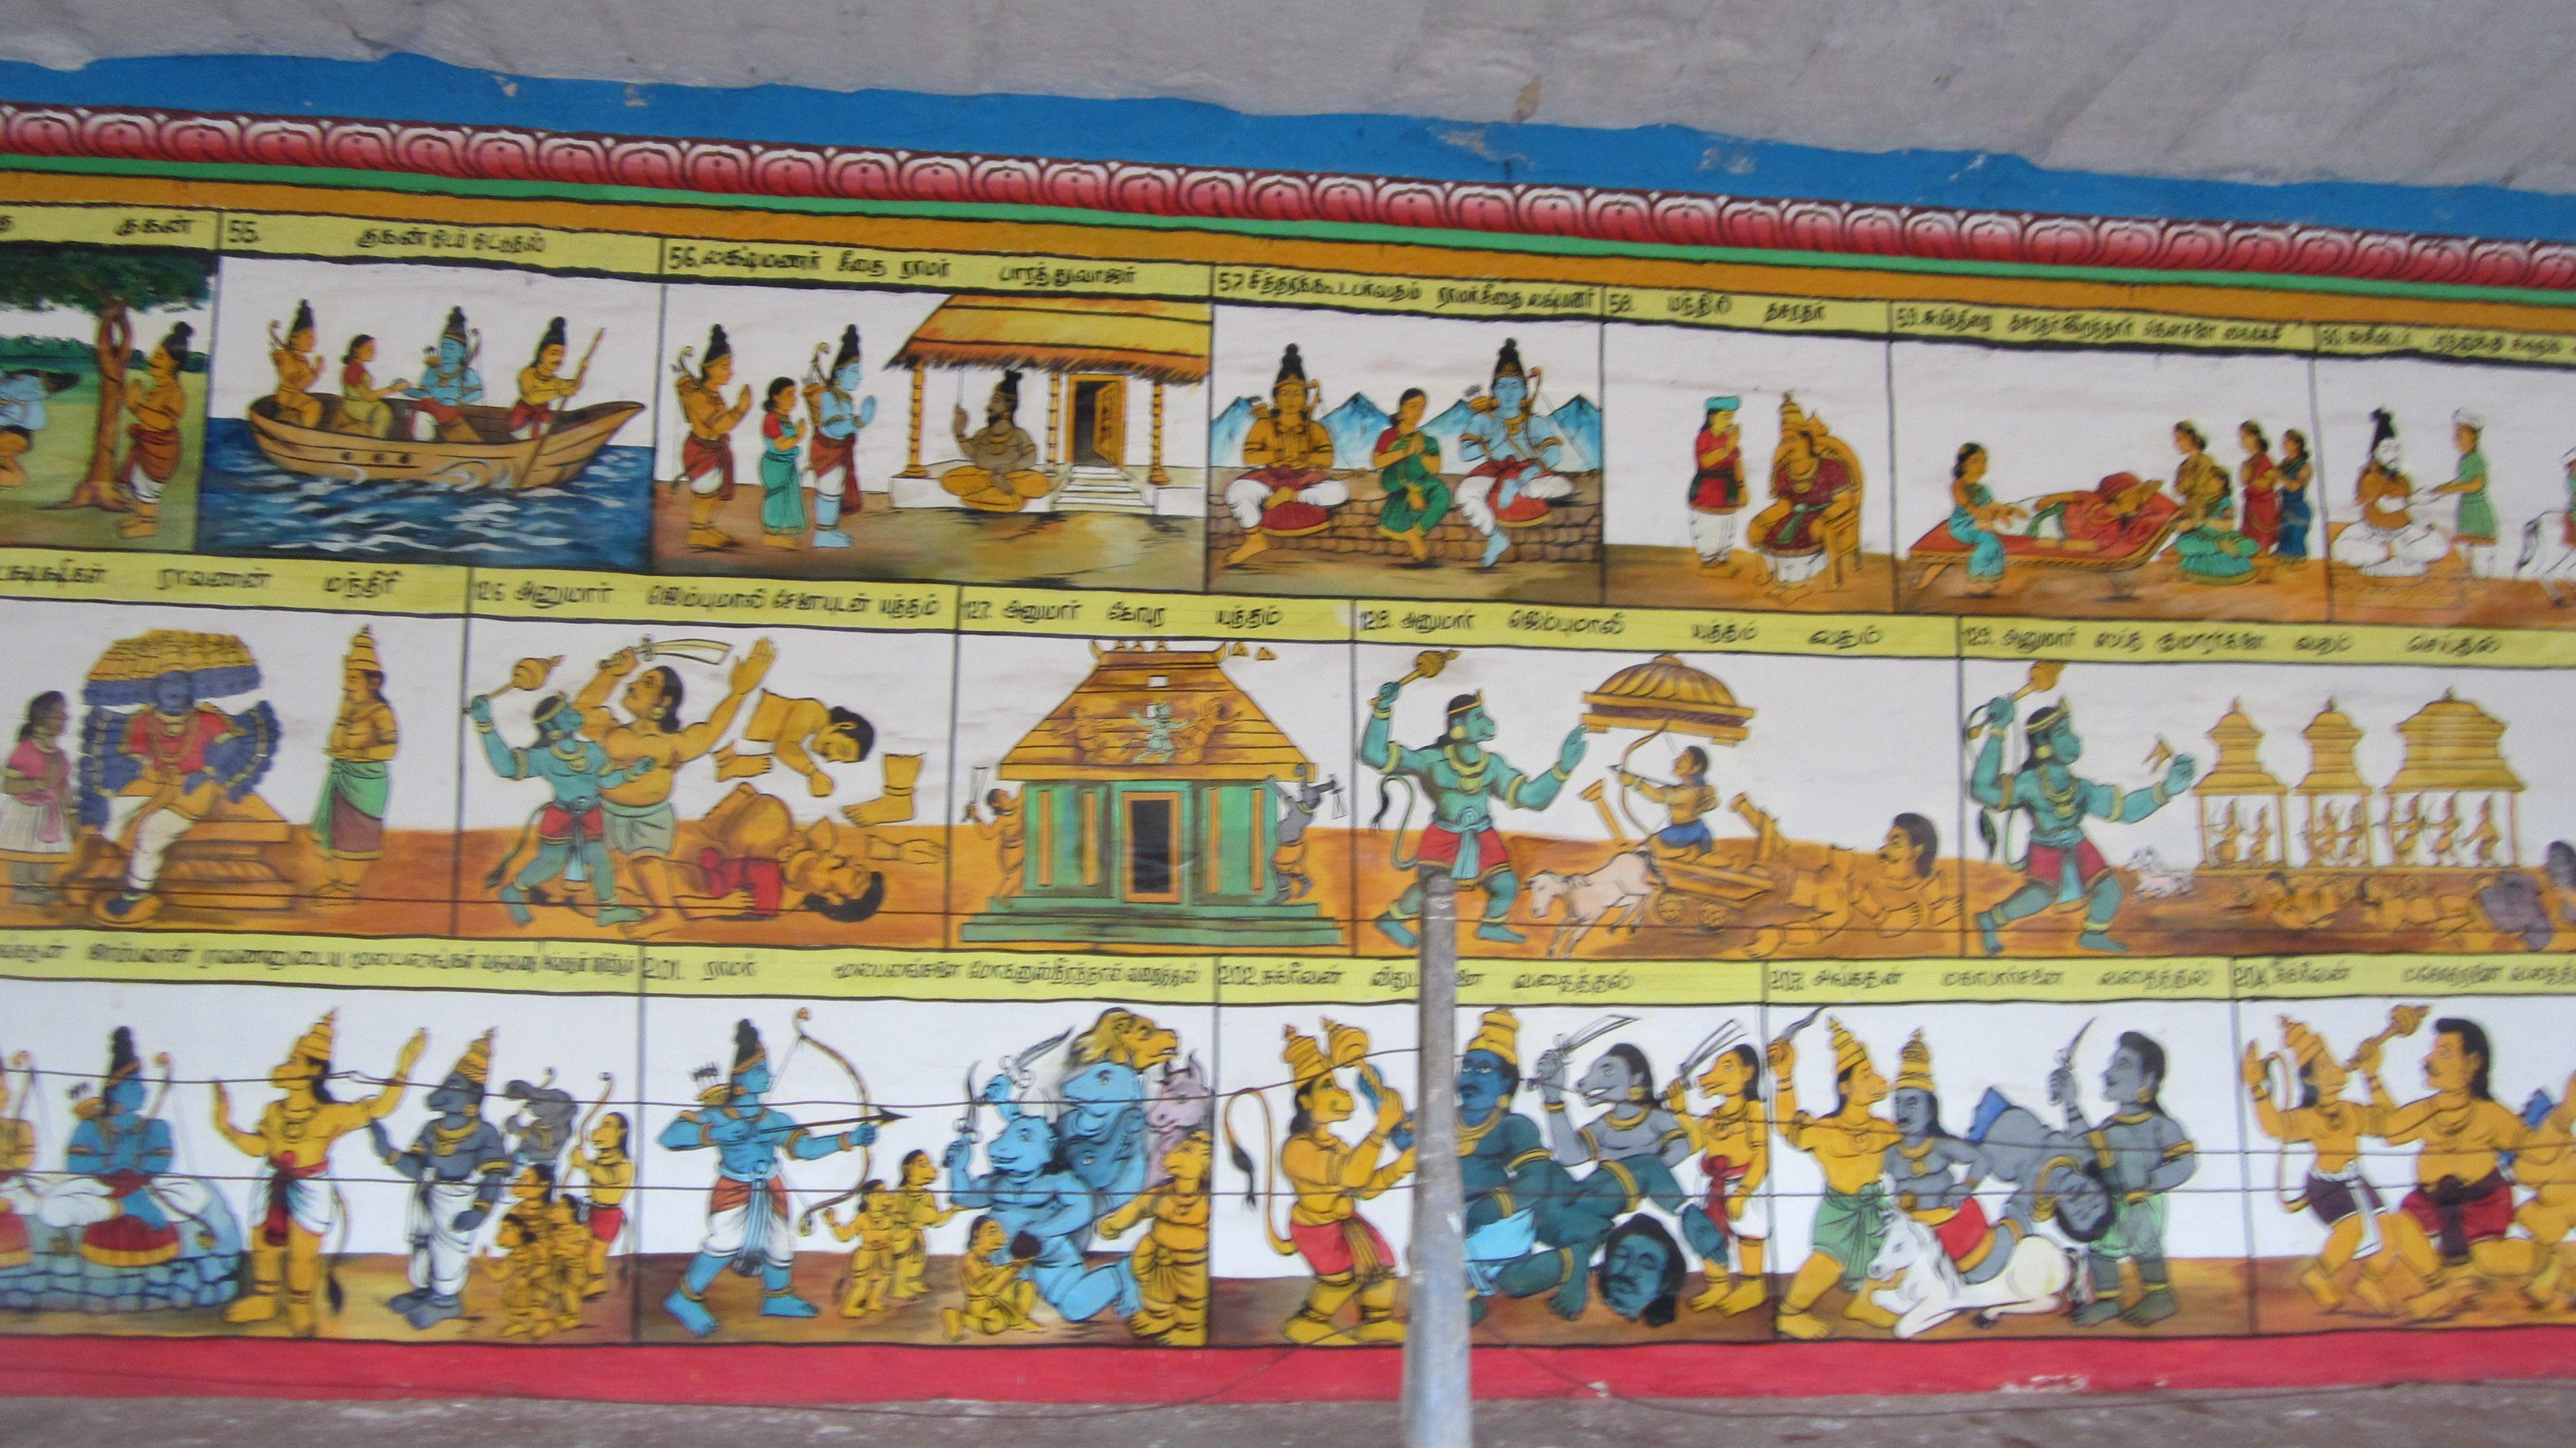 Ramaswamy Temple - Kumbakonam - India - Ramayana painting | Temple art,  Painting, Art